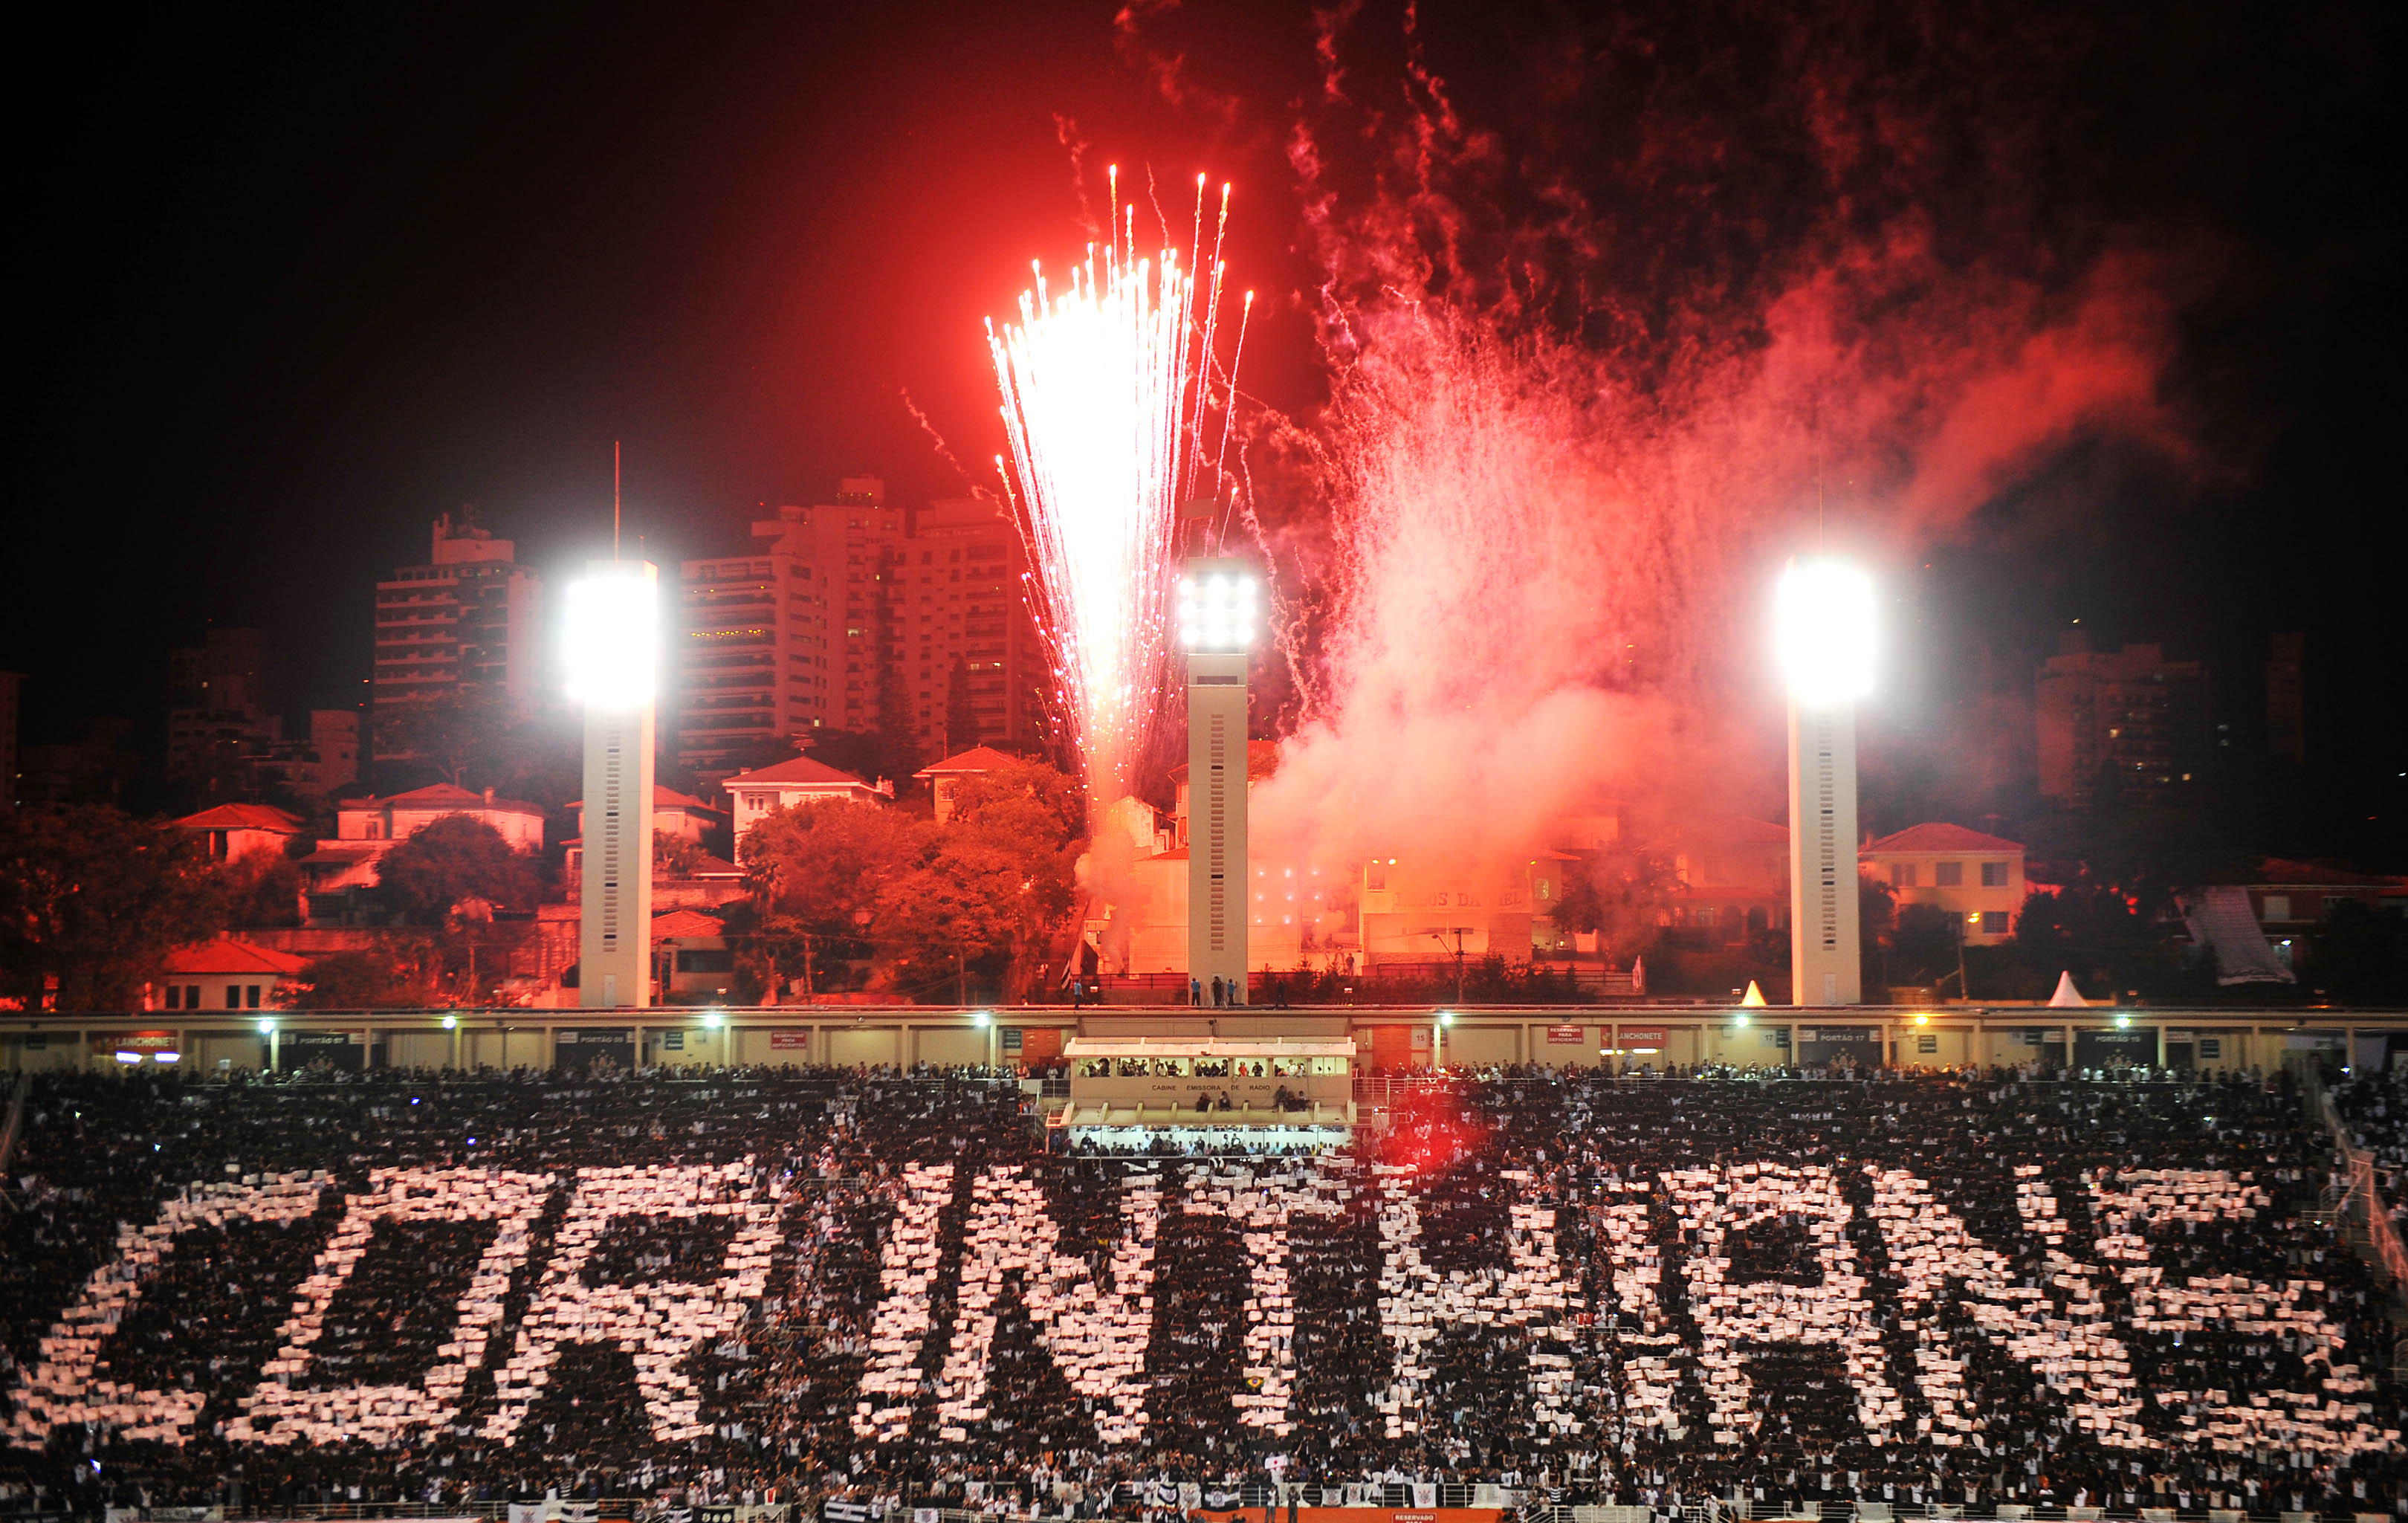 Corinthians - Pacaembu